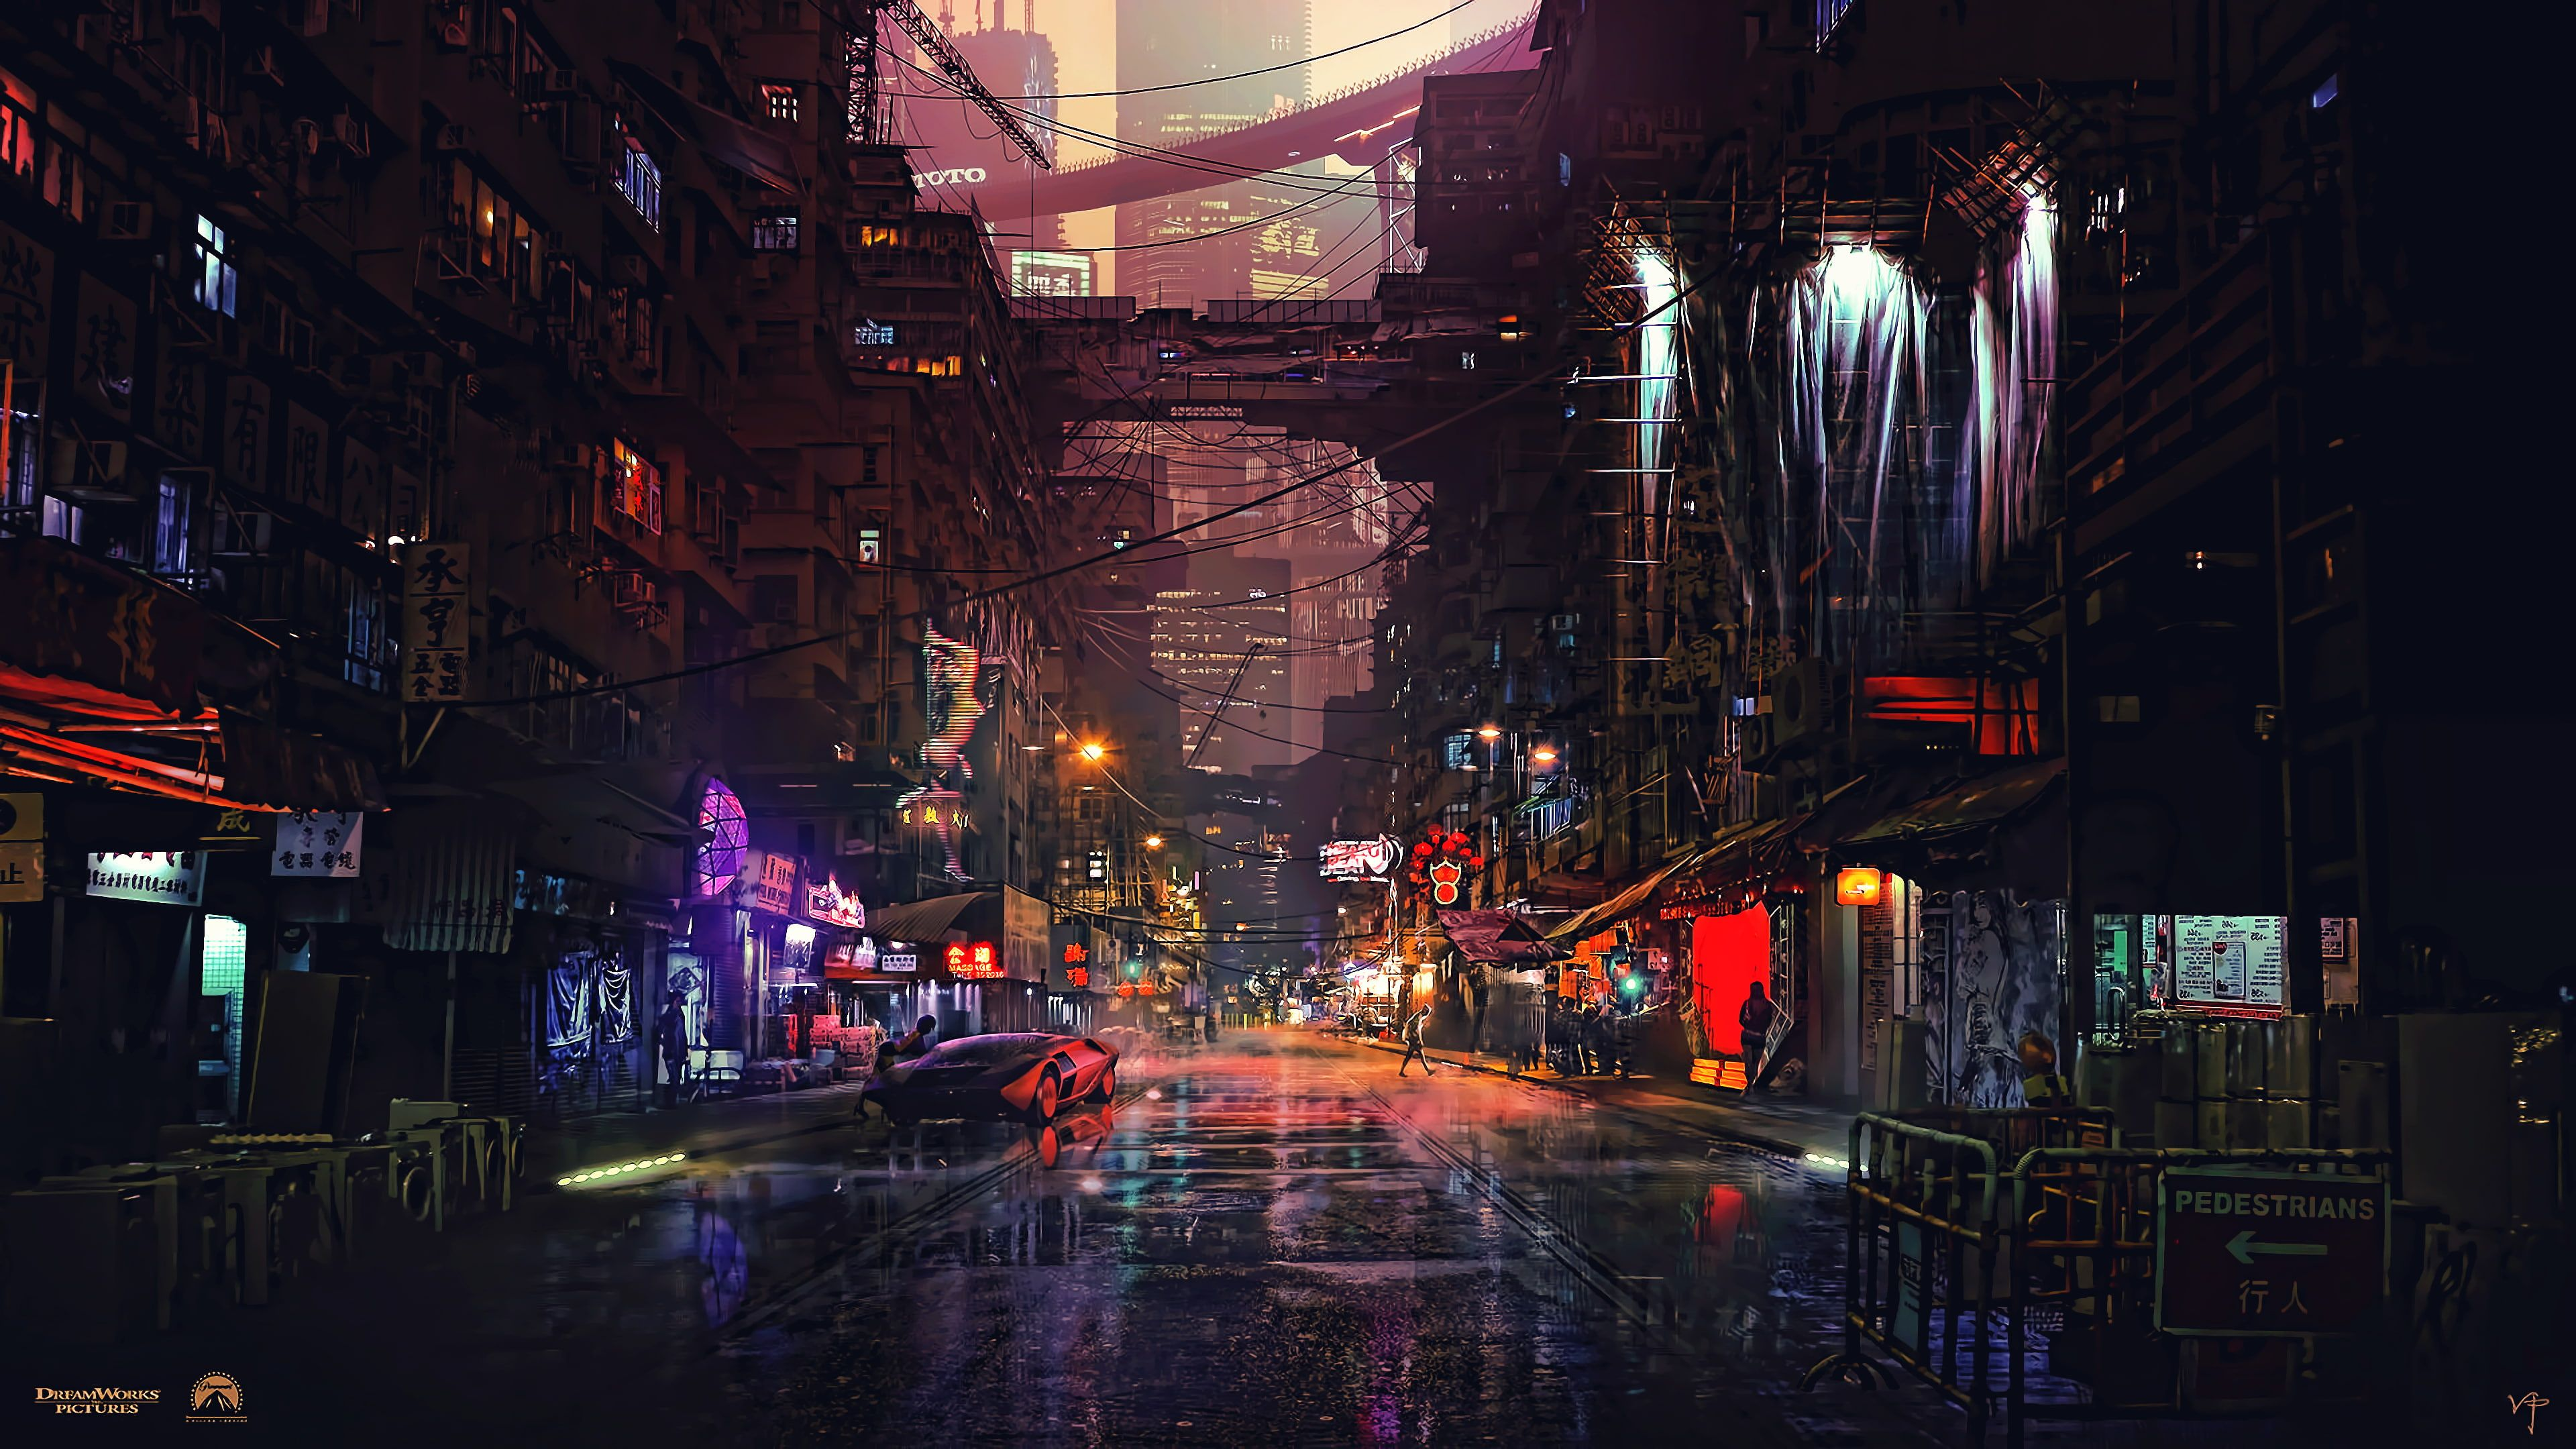 Concept Art Cyber Artwork Science Fiction Futuristic City Night Ghost In The Shell Cyberpunk Digita City Lights Wallpaper Futuristic City Digital Wallpaper